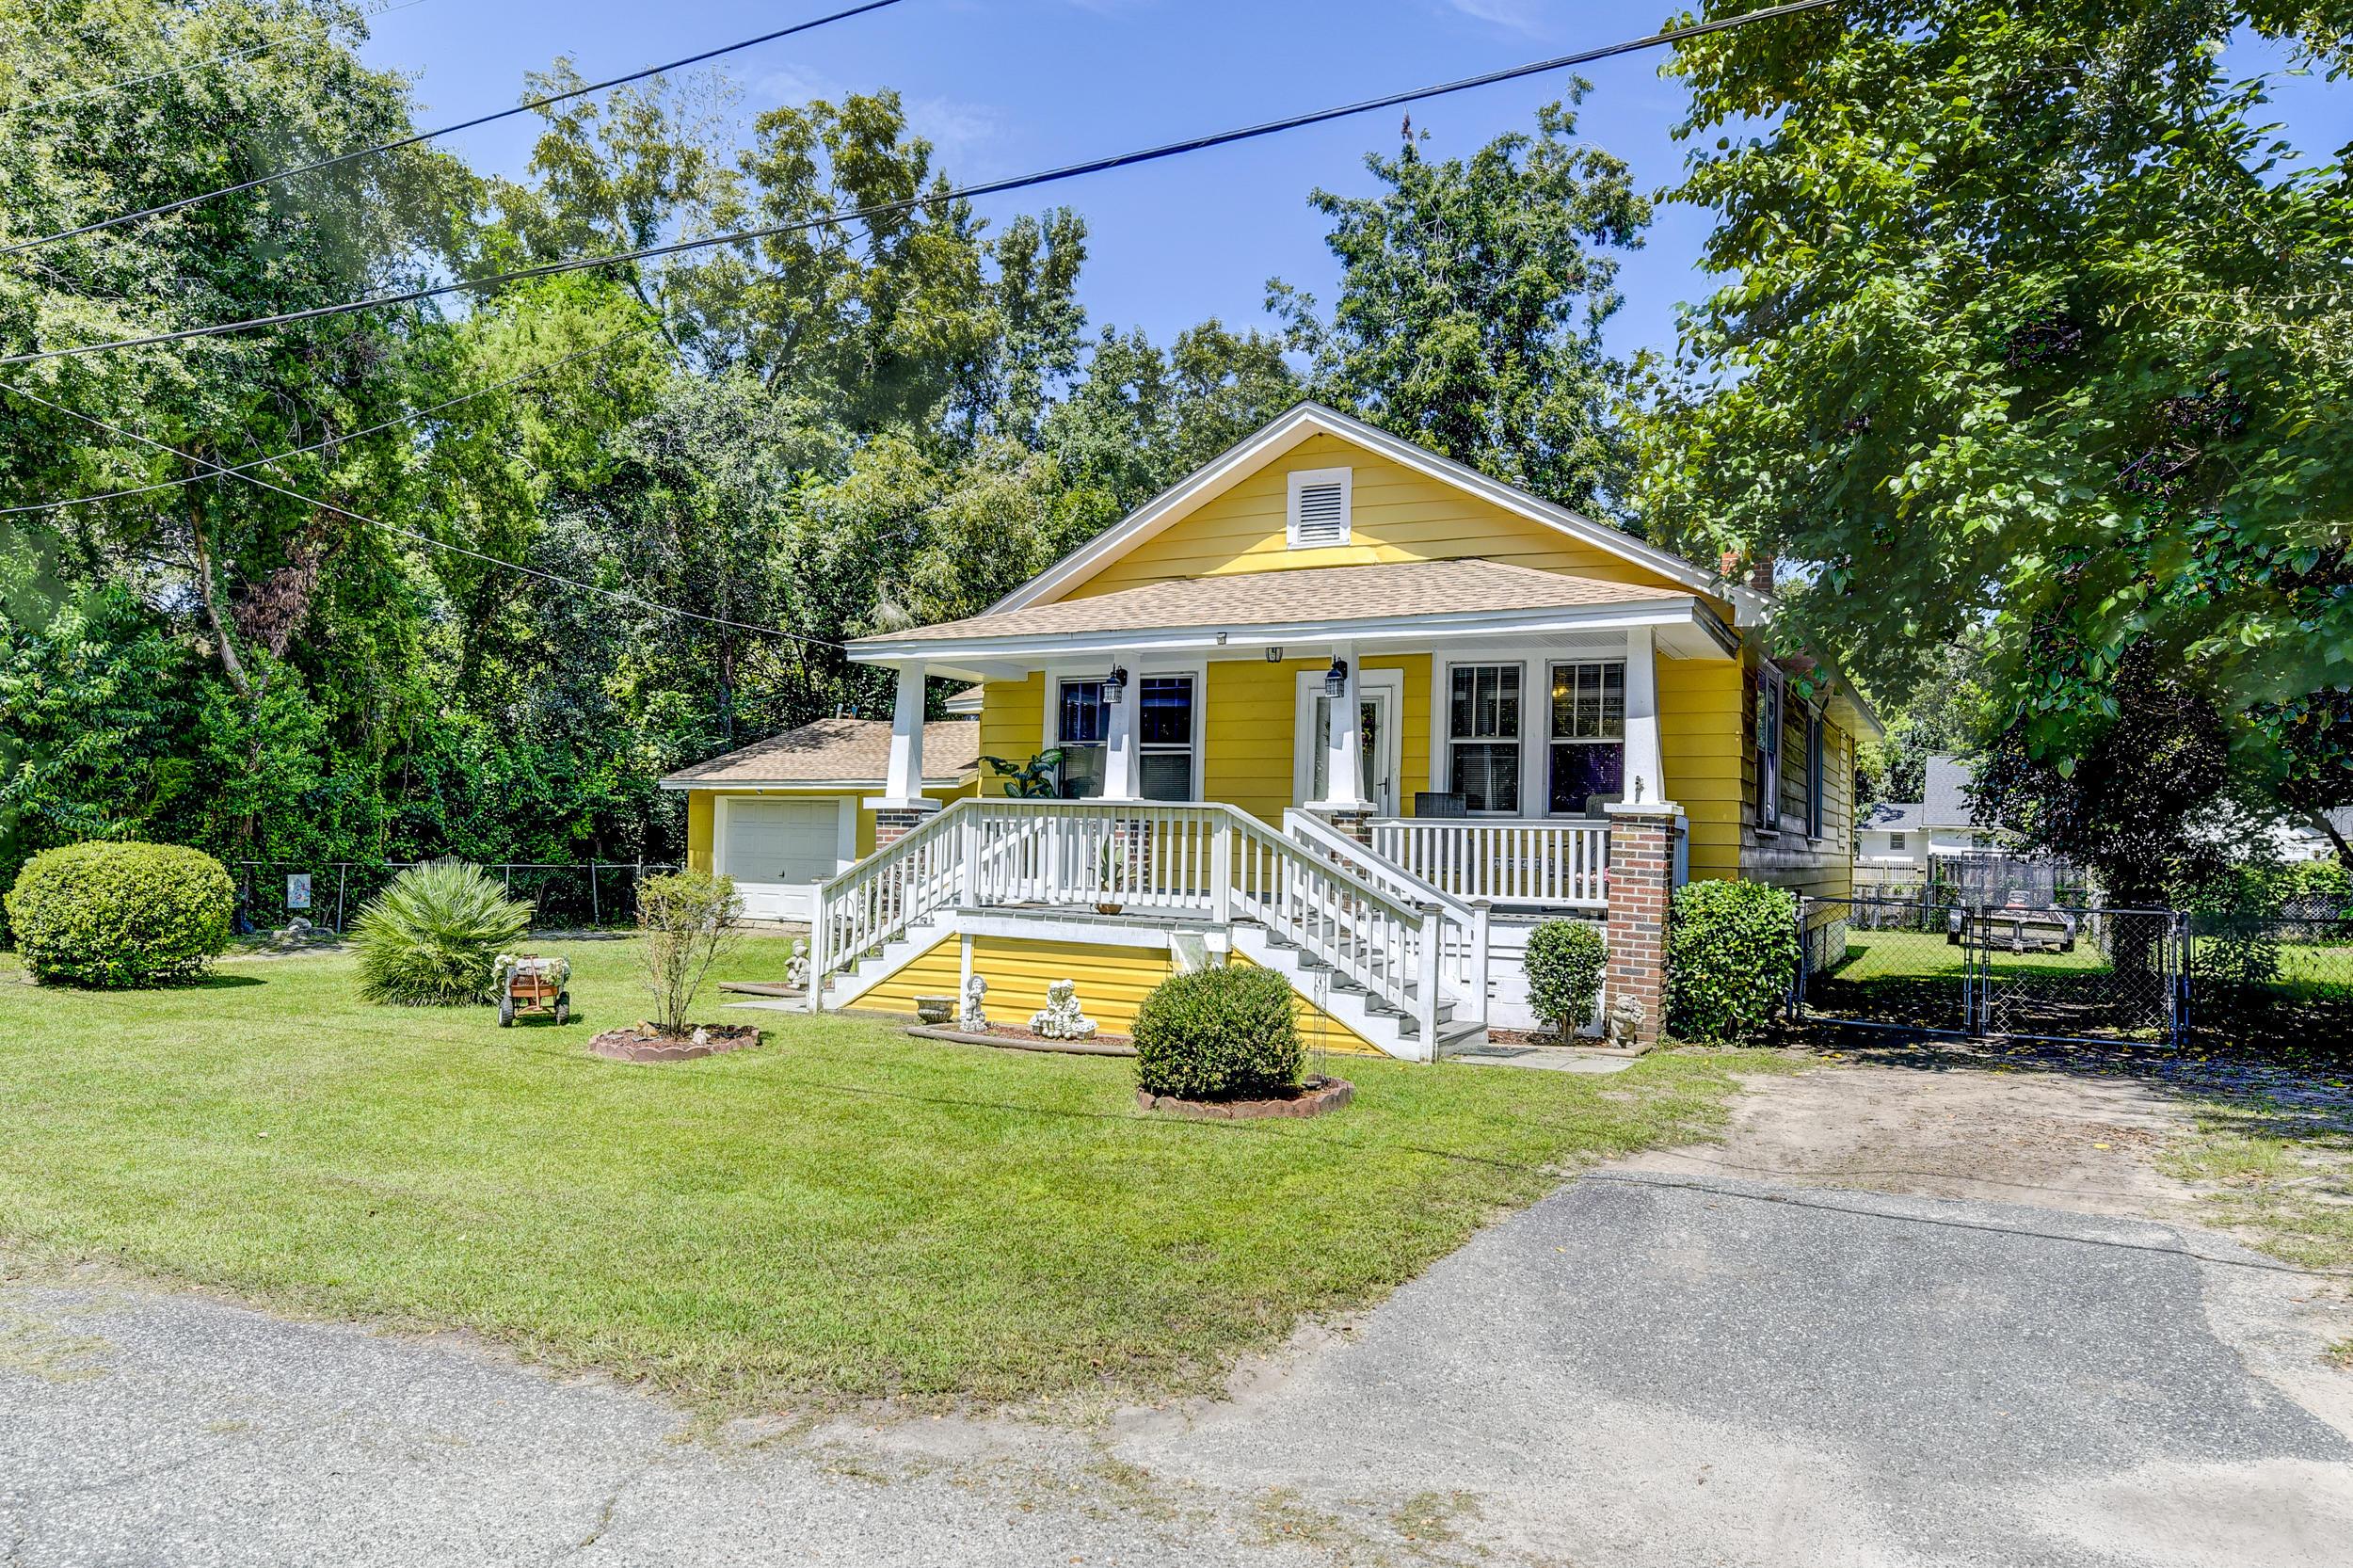 St Andrews Homes For Sale - 1908 2nd, Charleston, SC - 1